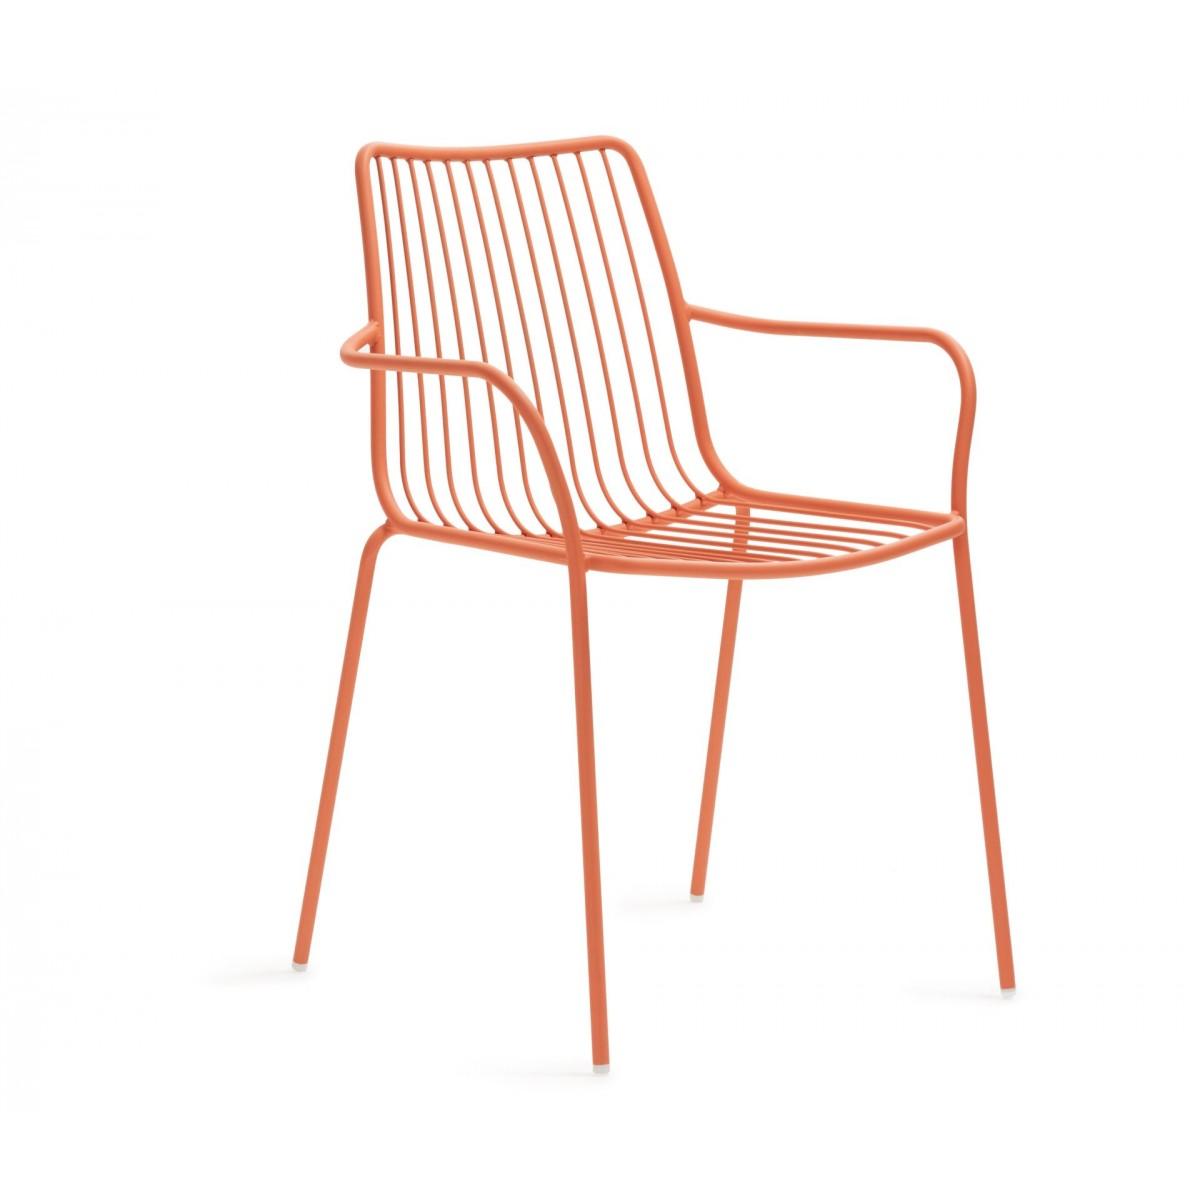 stuhl orange metall mit armlehne stapelbar gartenstuhl mit armlehne orange metall. Black Bedroom Furniture Sets. Home Design Ideas